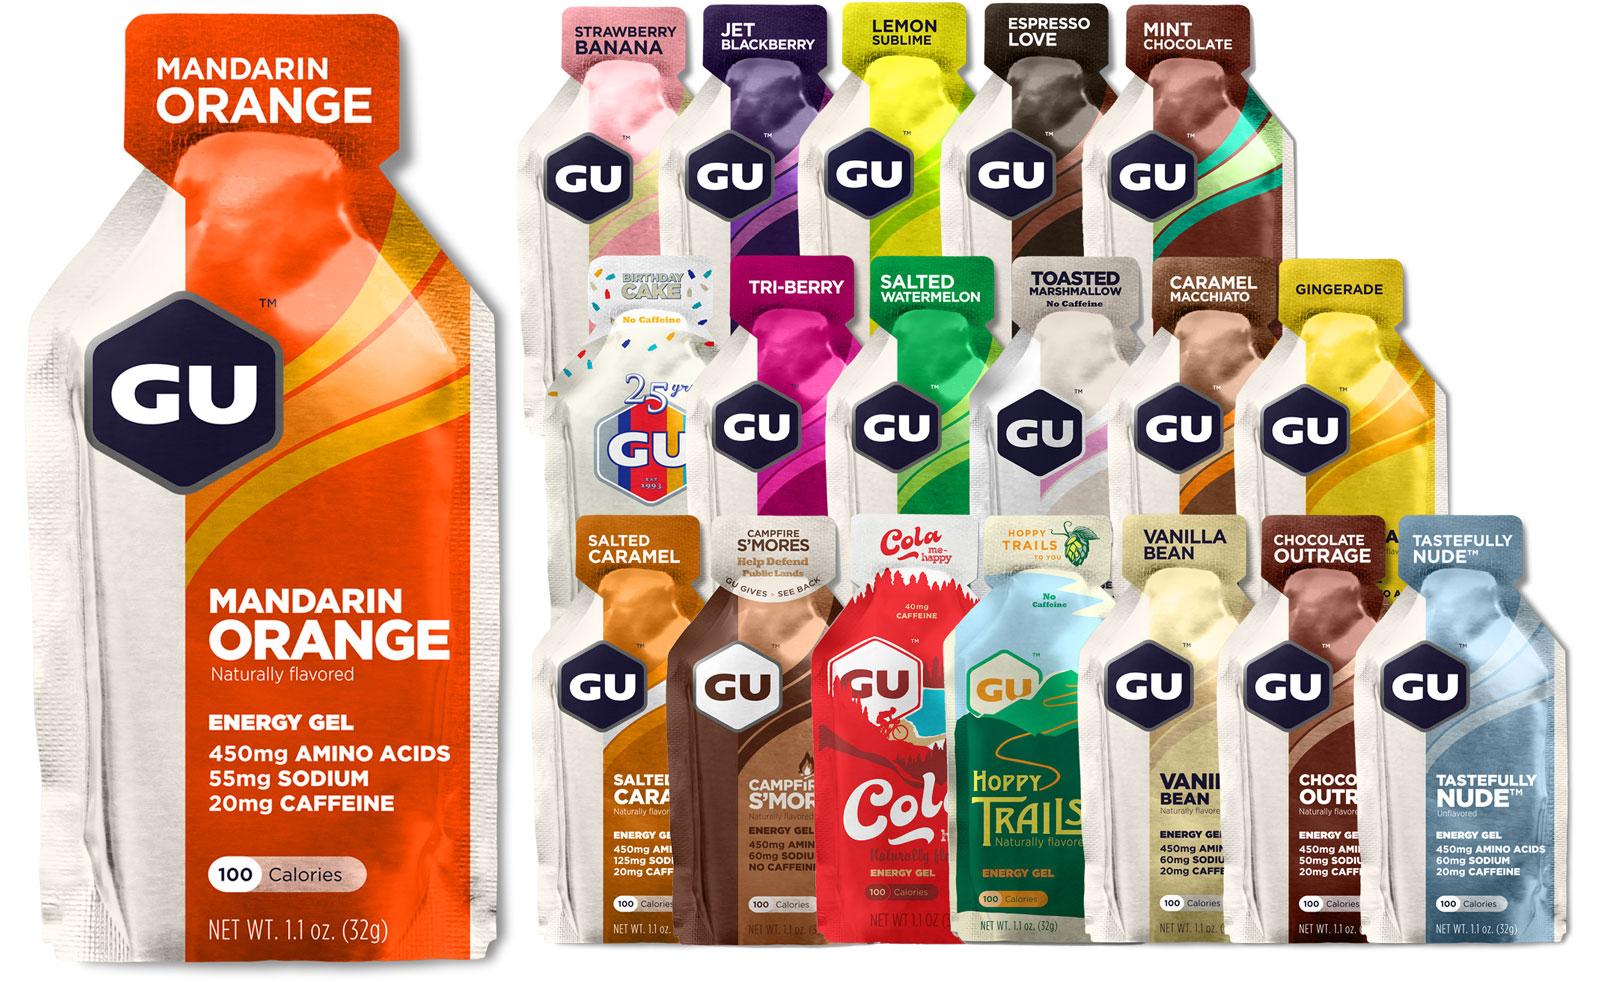 GU Energy Gel with Carbohydrates - 6x32g